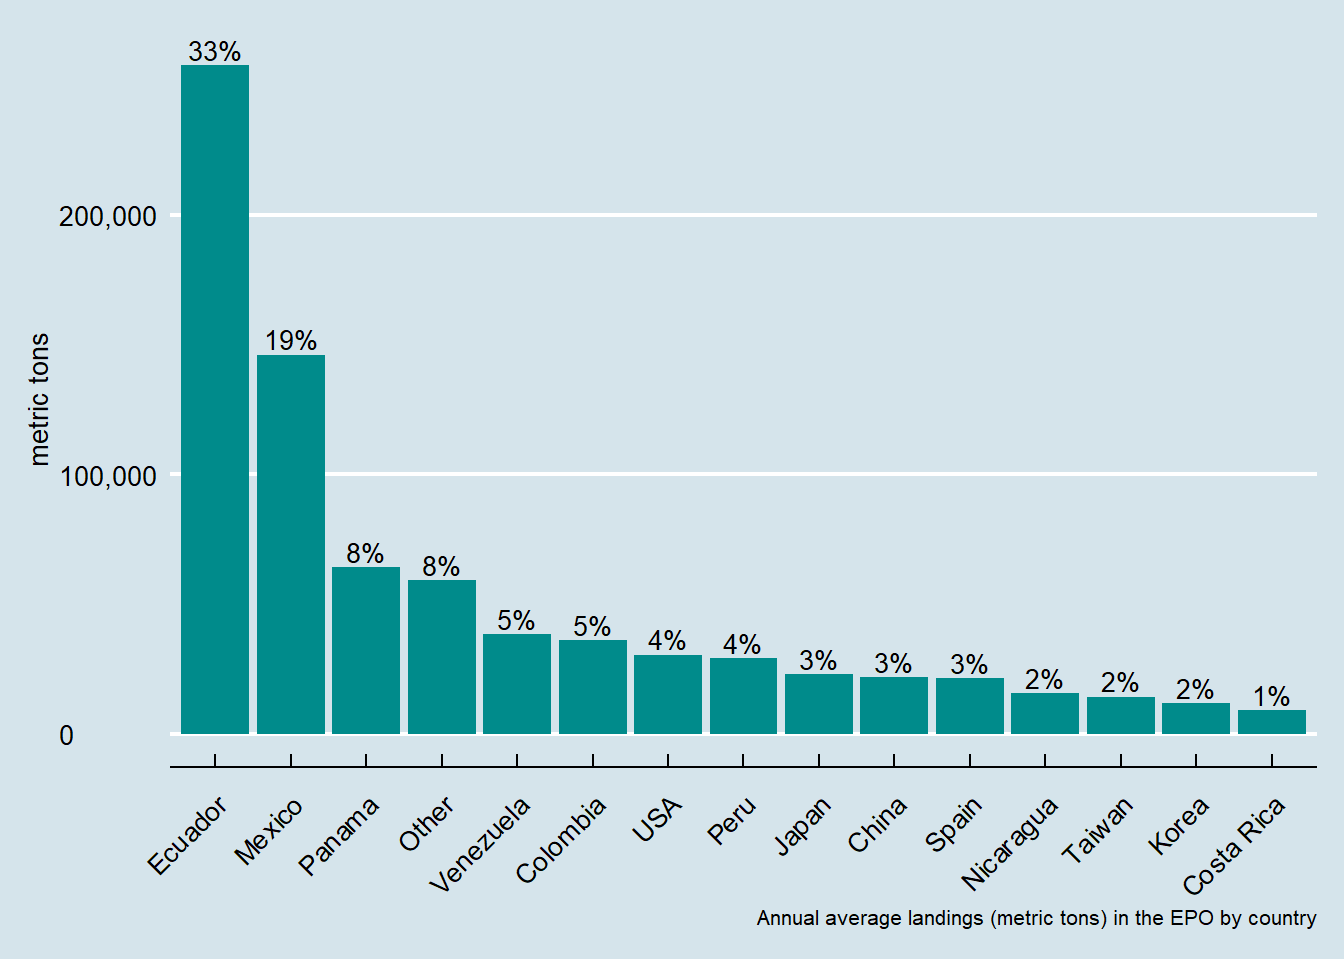 Average annual landings in metric tons by country in the Eastern Pacific Ocean.